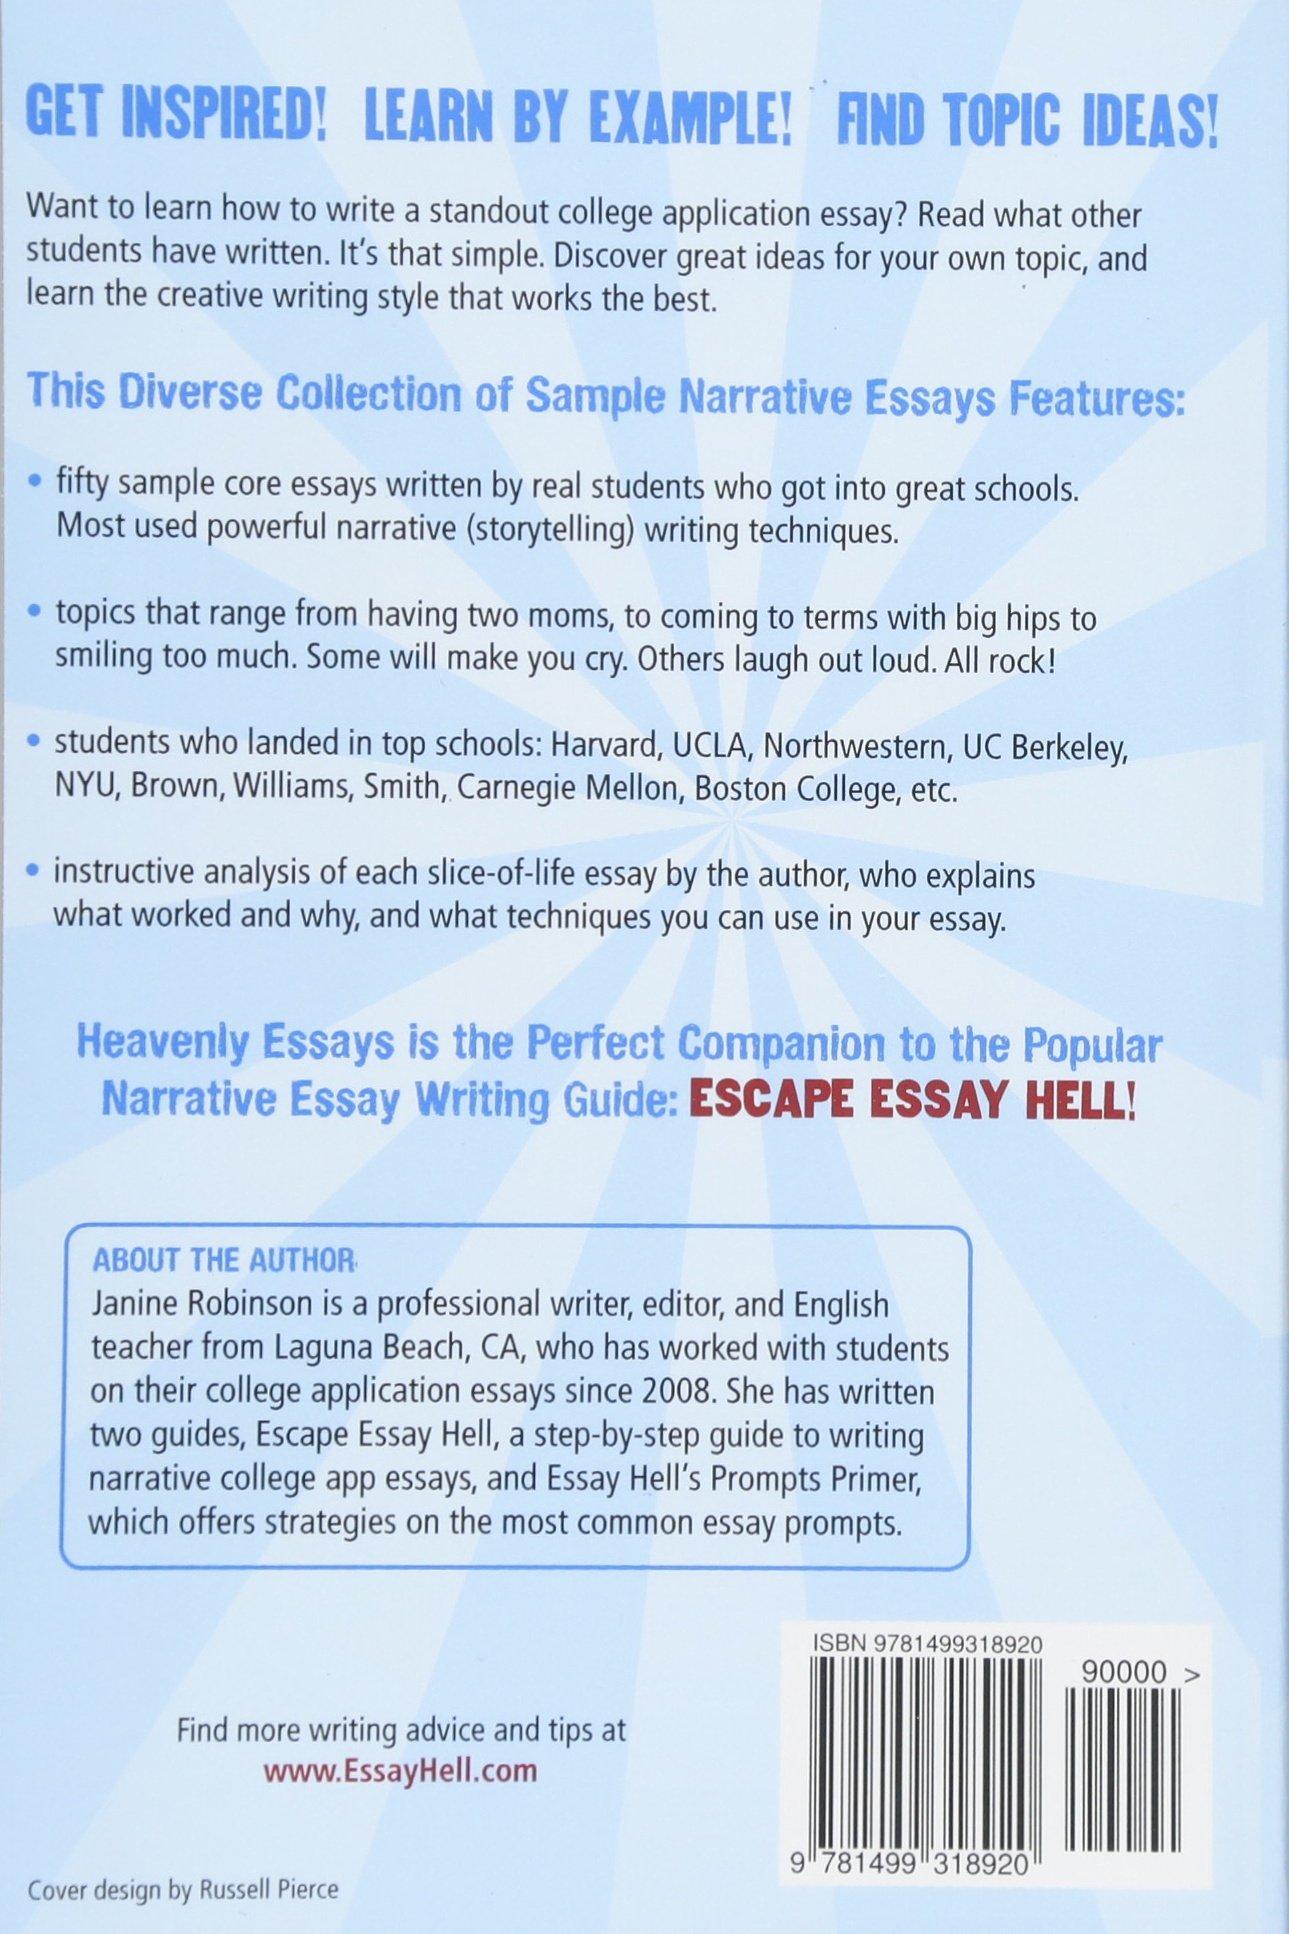 022 Essay Example Ideas For Narrative Beautiful A Fictional Writing Personal Descriptive Full